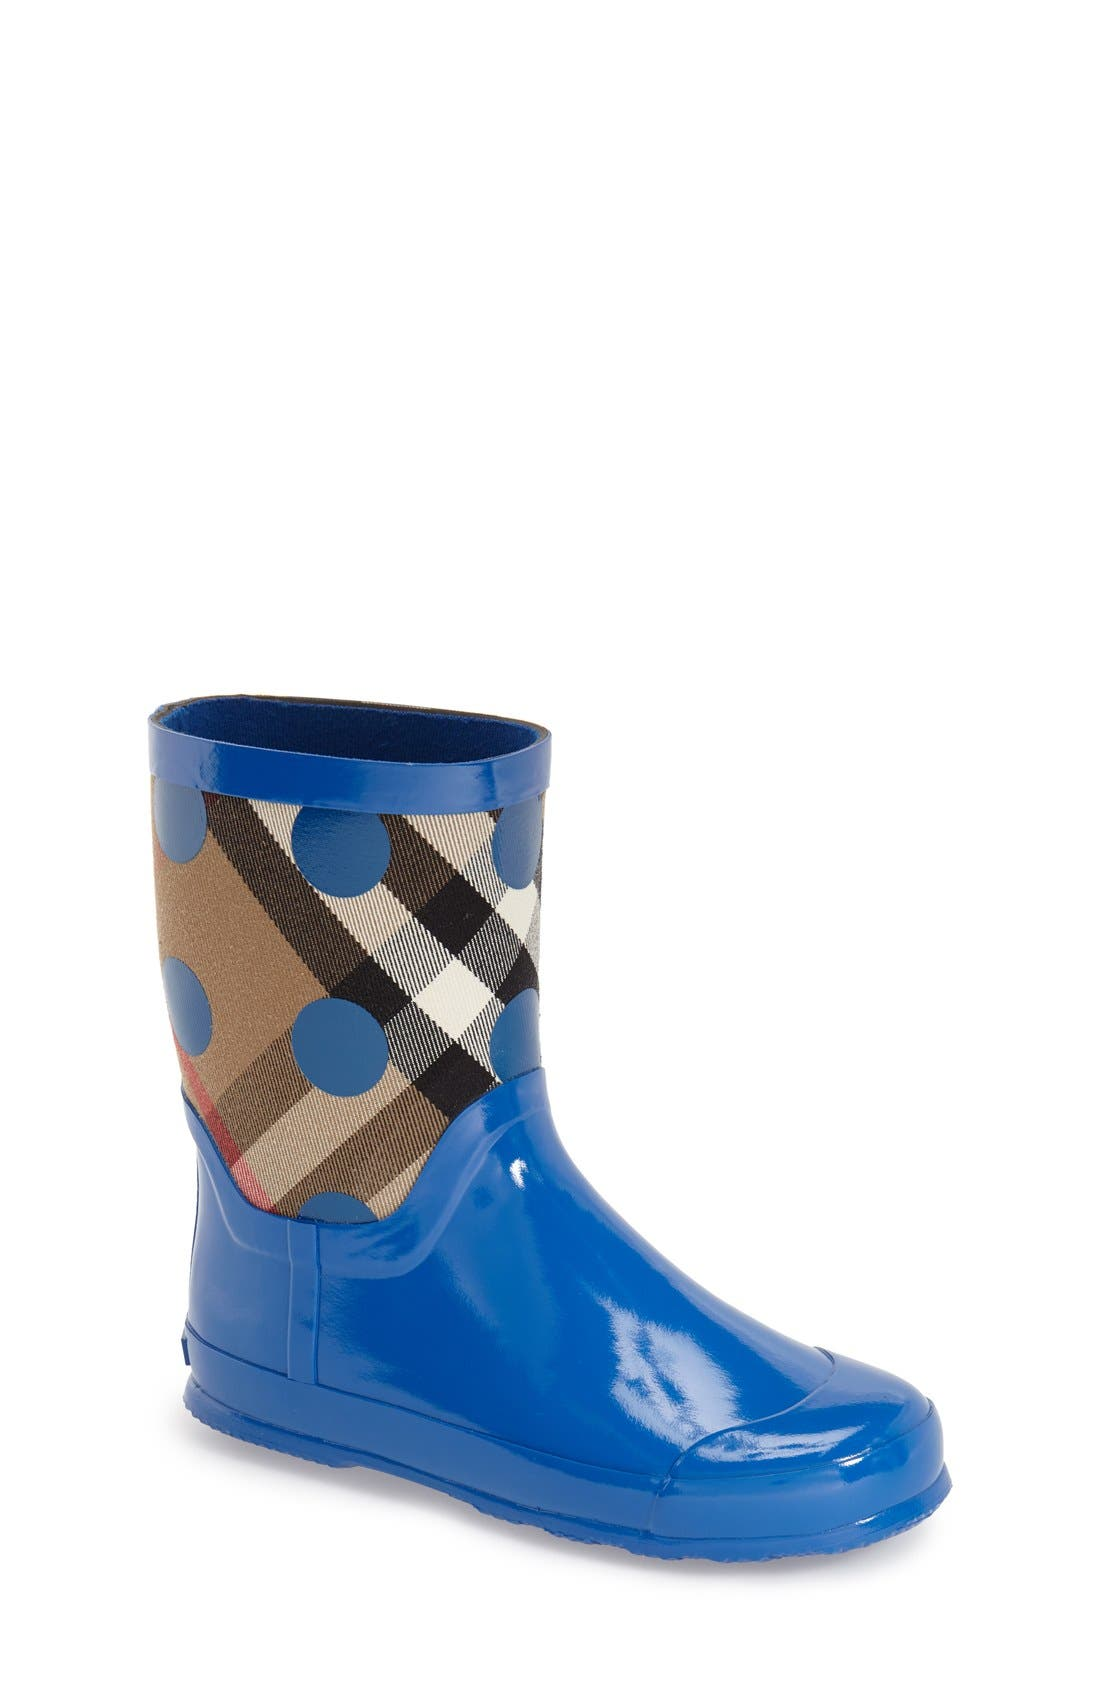 'Ranmoor' Waterproof Rain Boot,                             Main thumbnail 1, color,